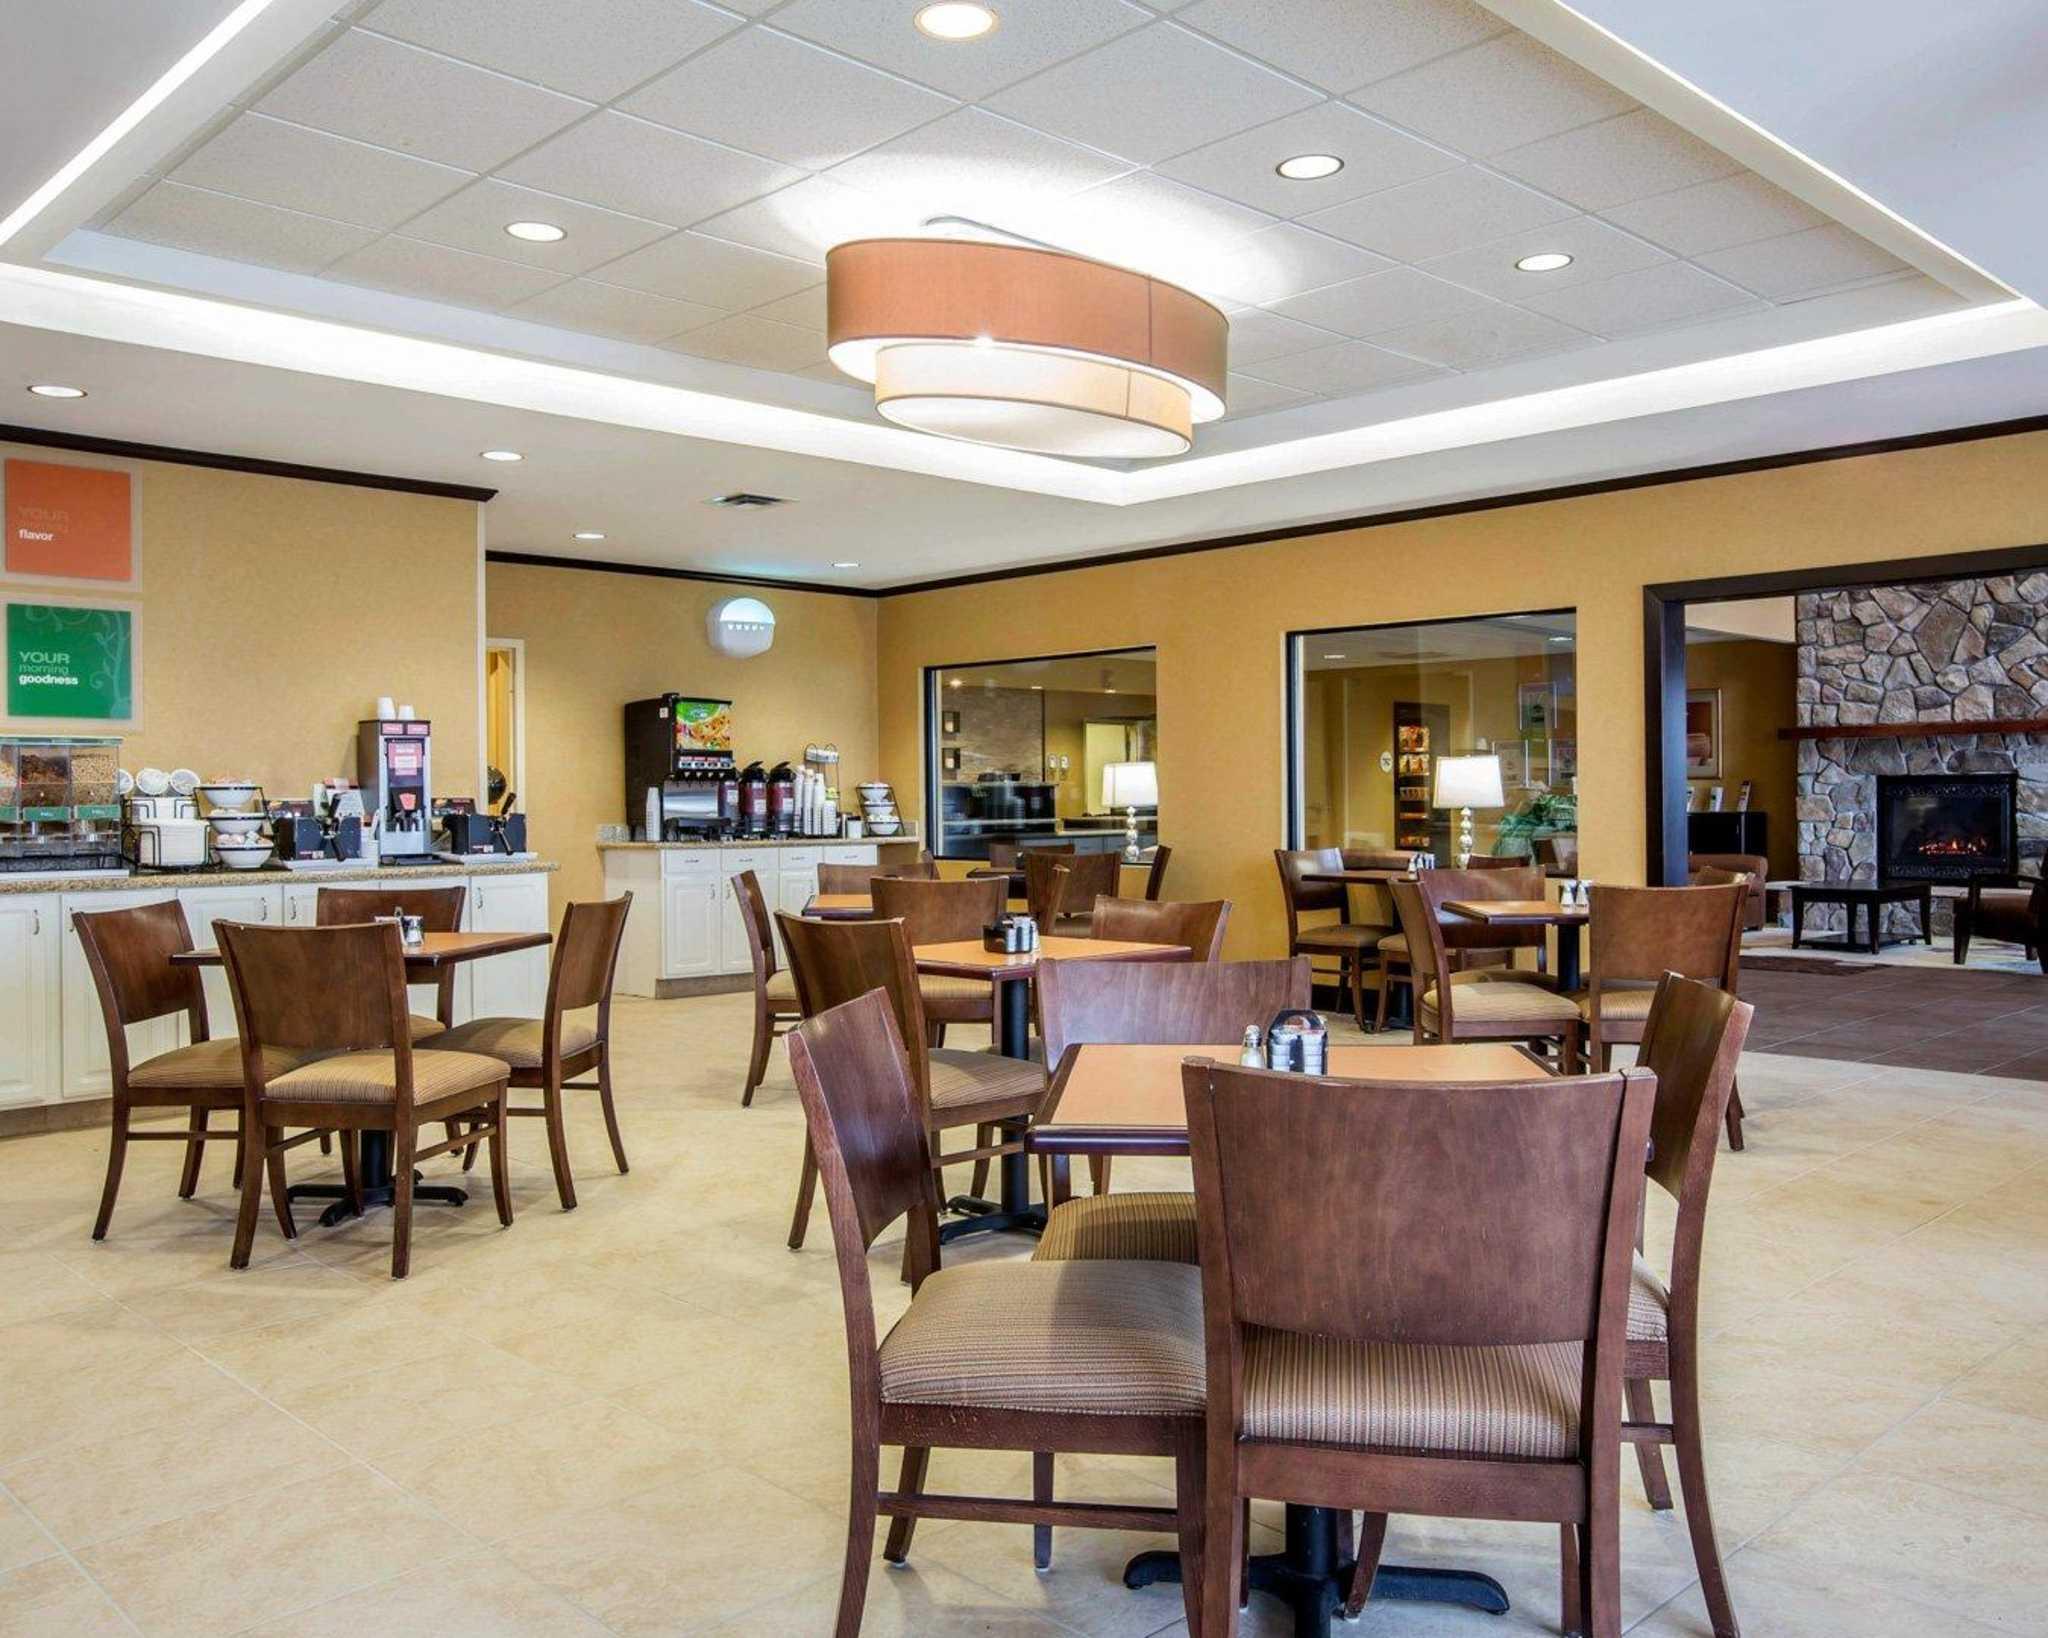 Comfort Inn & Suites adj to Akwesasne Mohawk Casino image 37